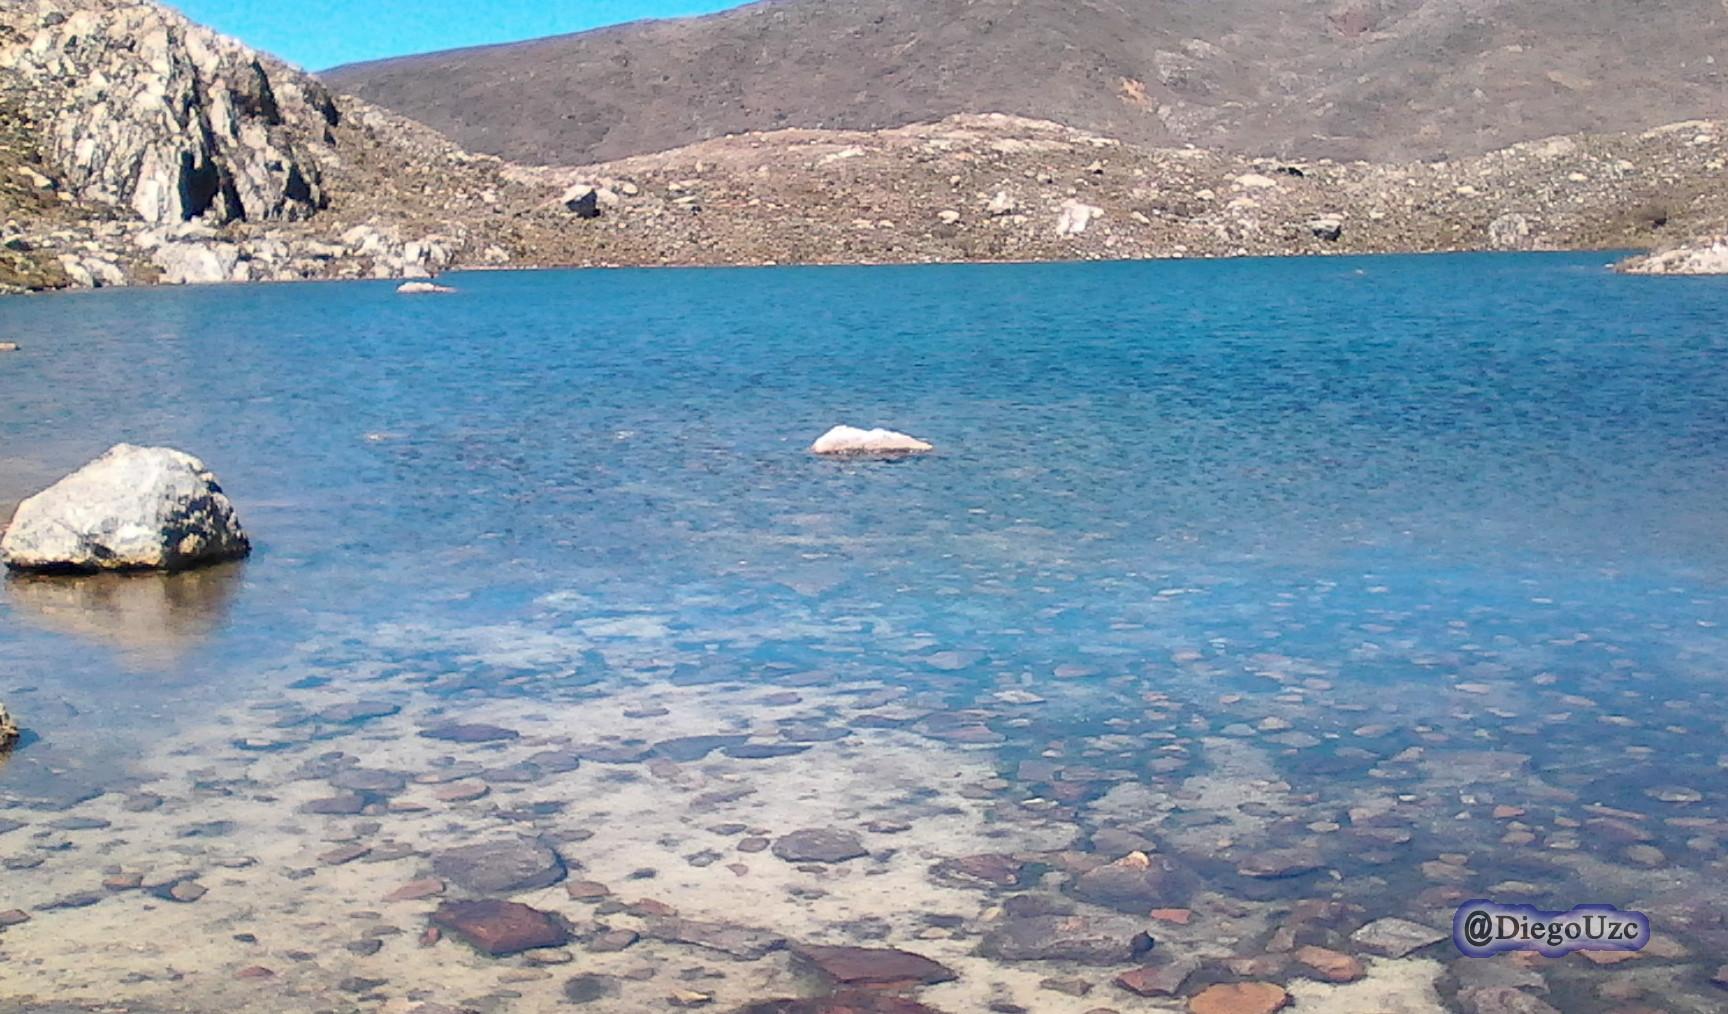 Capa traslucida en la Laguna Albarregas